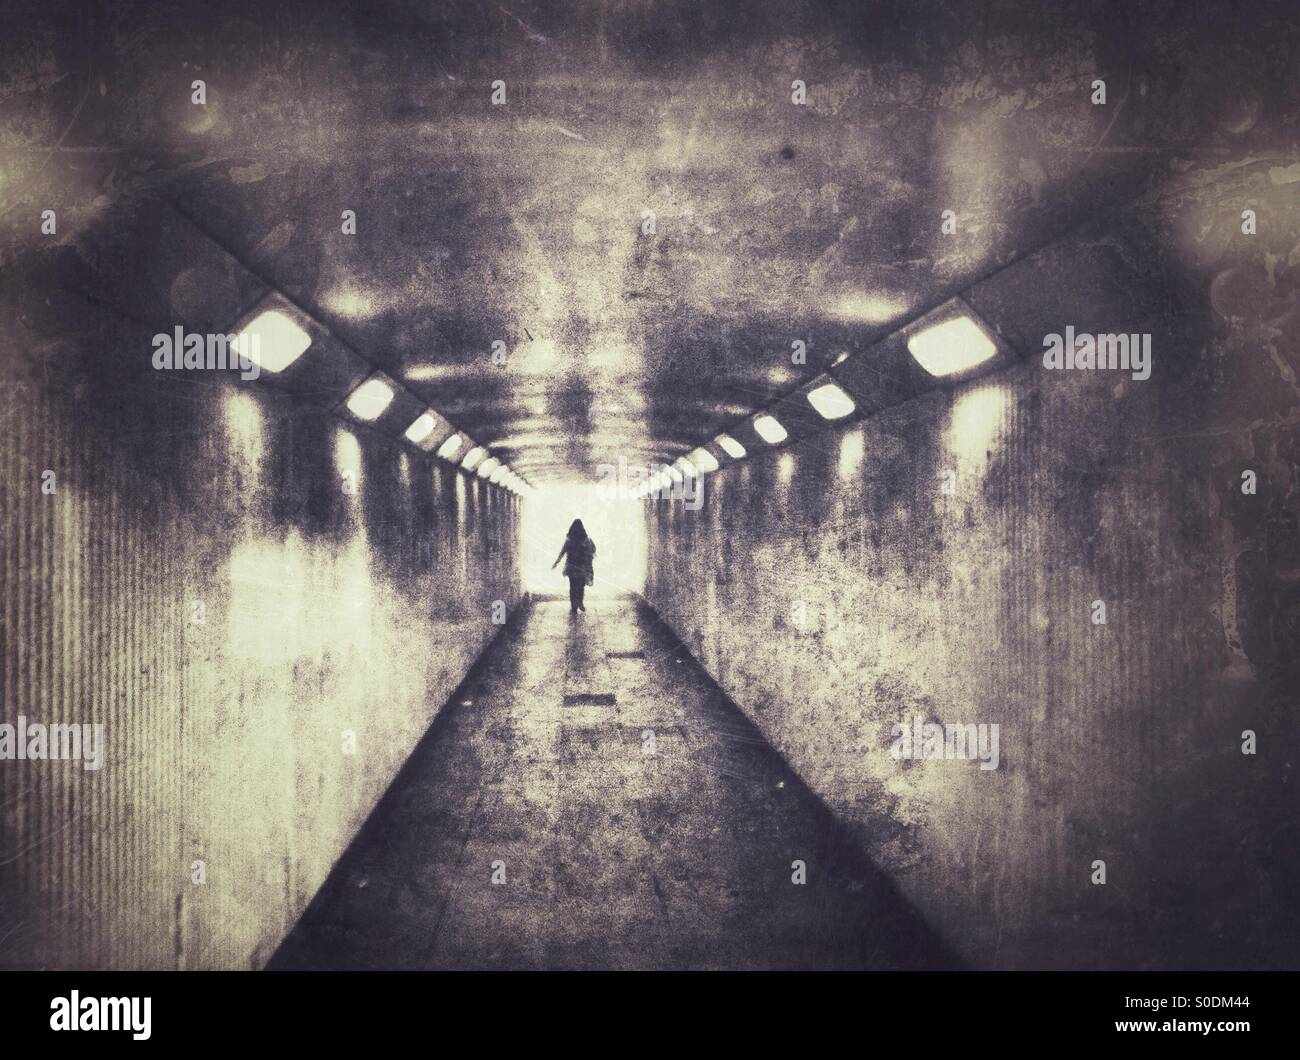 Lone female walking in dark underpass. - Stock Image